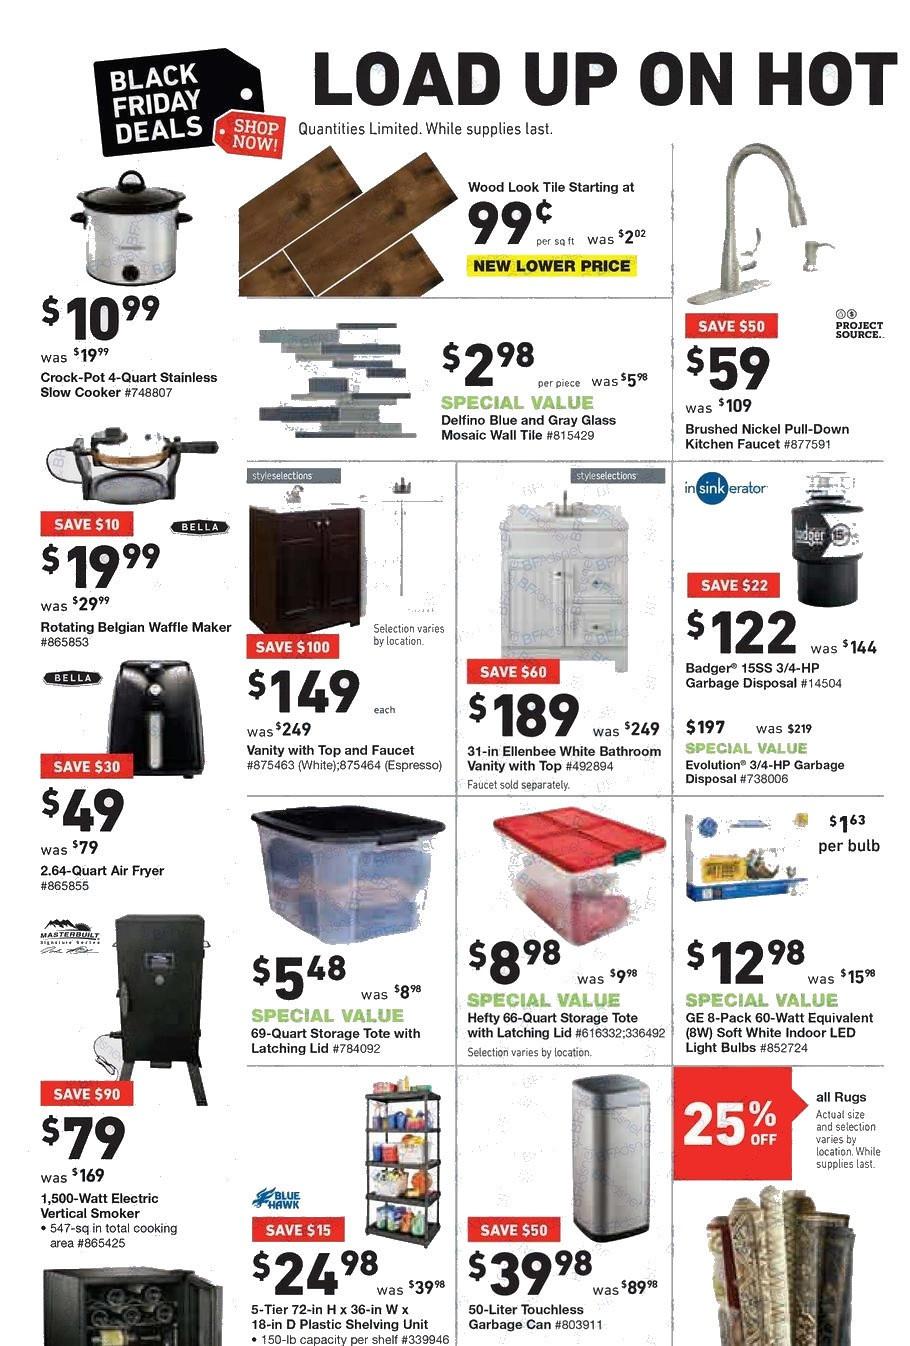 lowes black friday ads sales deals doorbusters 2017 promo codes deals 2018 couponshy. Black Bedroom Furniture Sets. Home Design Ideas